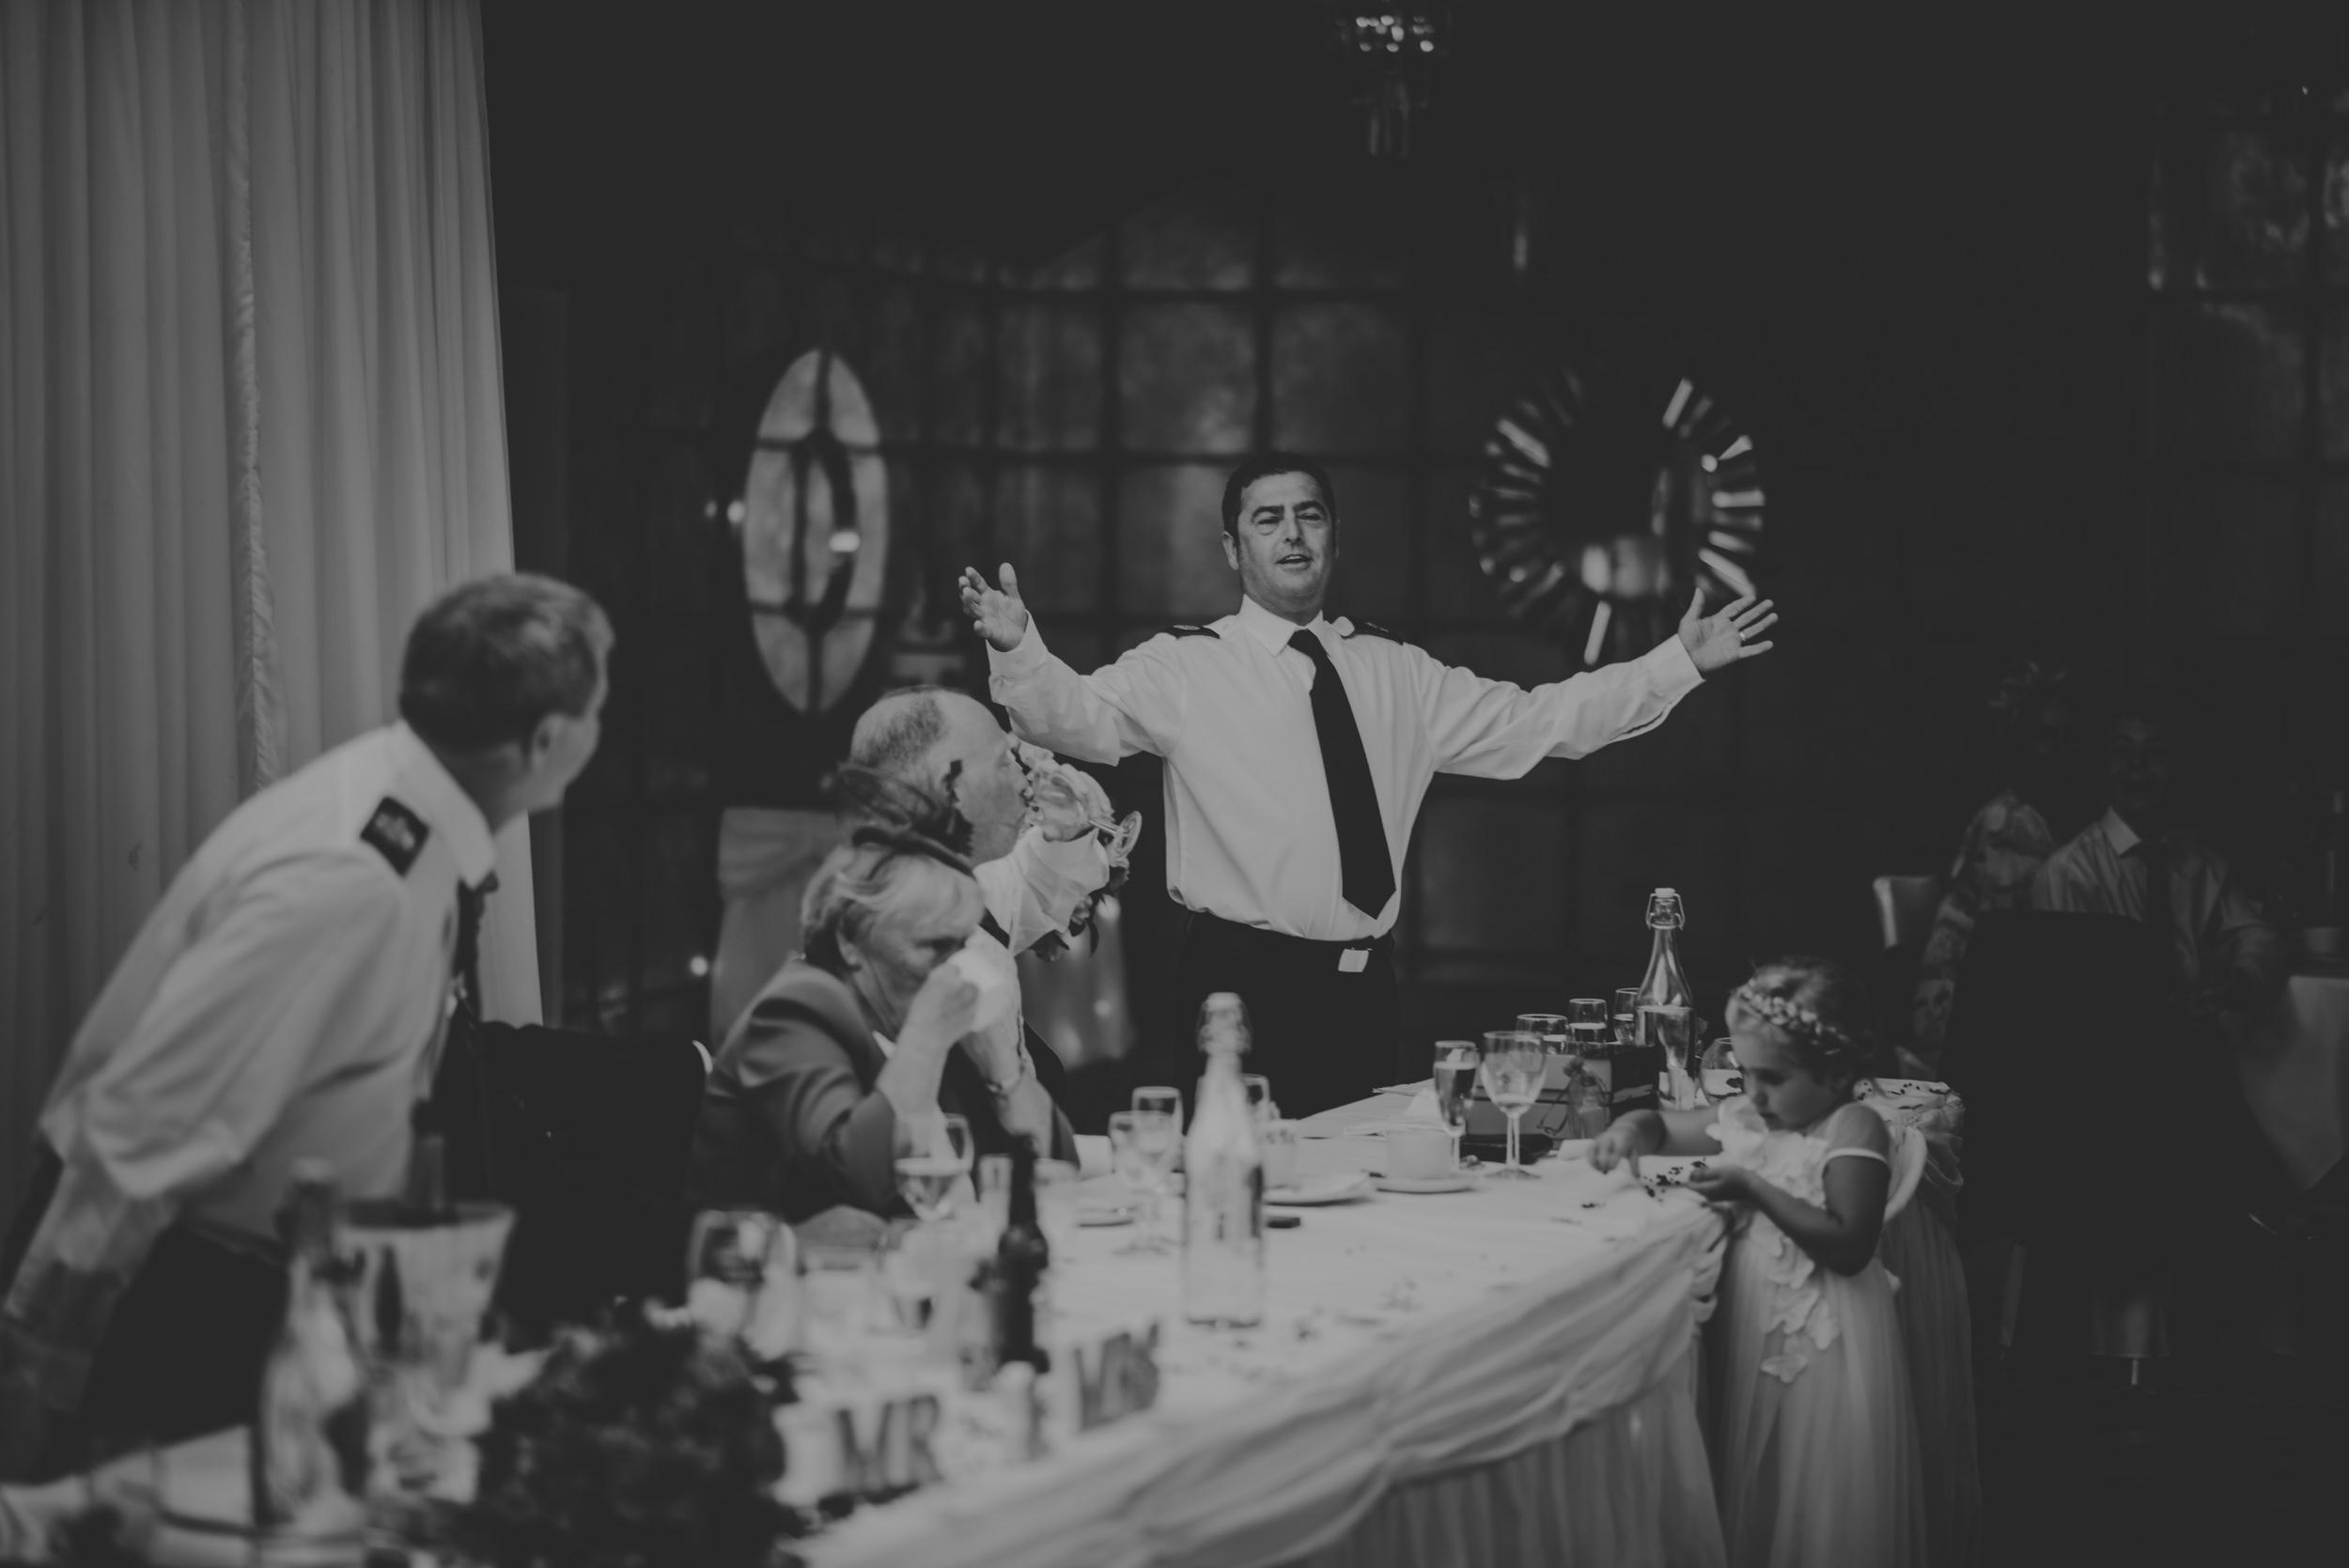 Chantelle-and-Stephen-Old-Thorns-Hotel-Wedding-Liphook-Manu-Mendoza-Wedding-Photography-444.jpg